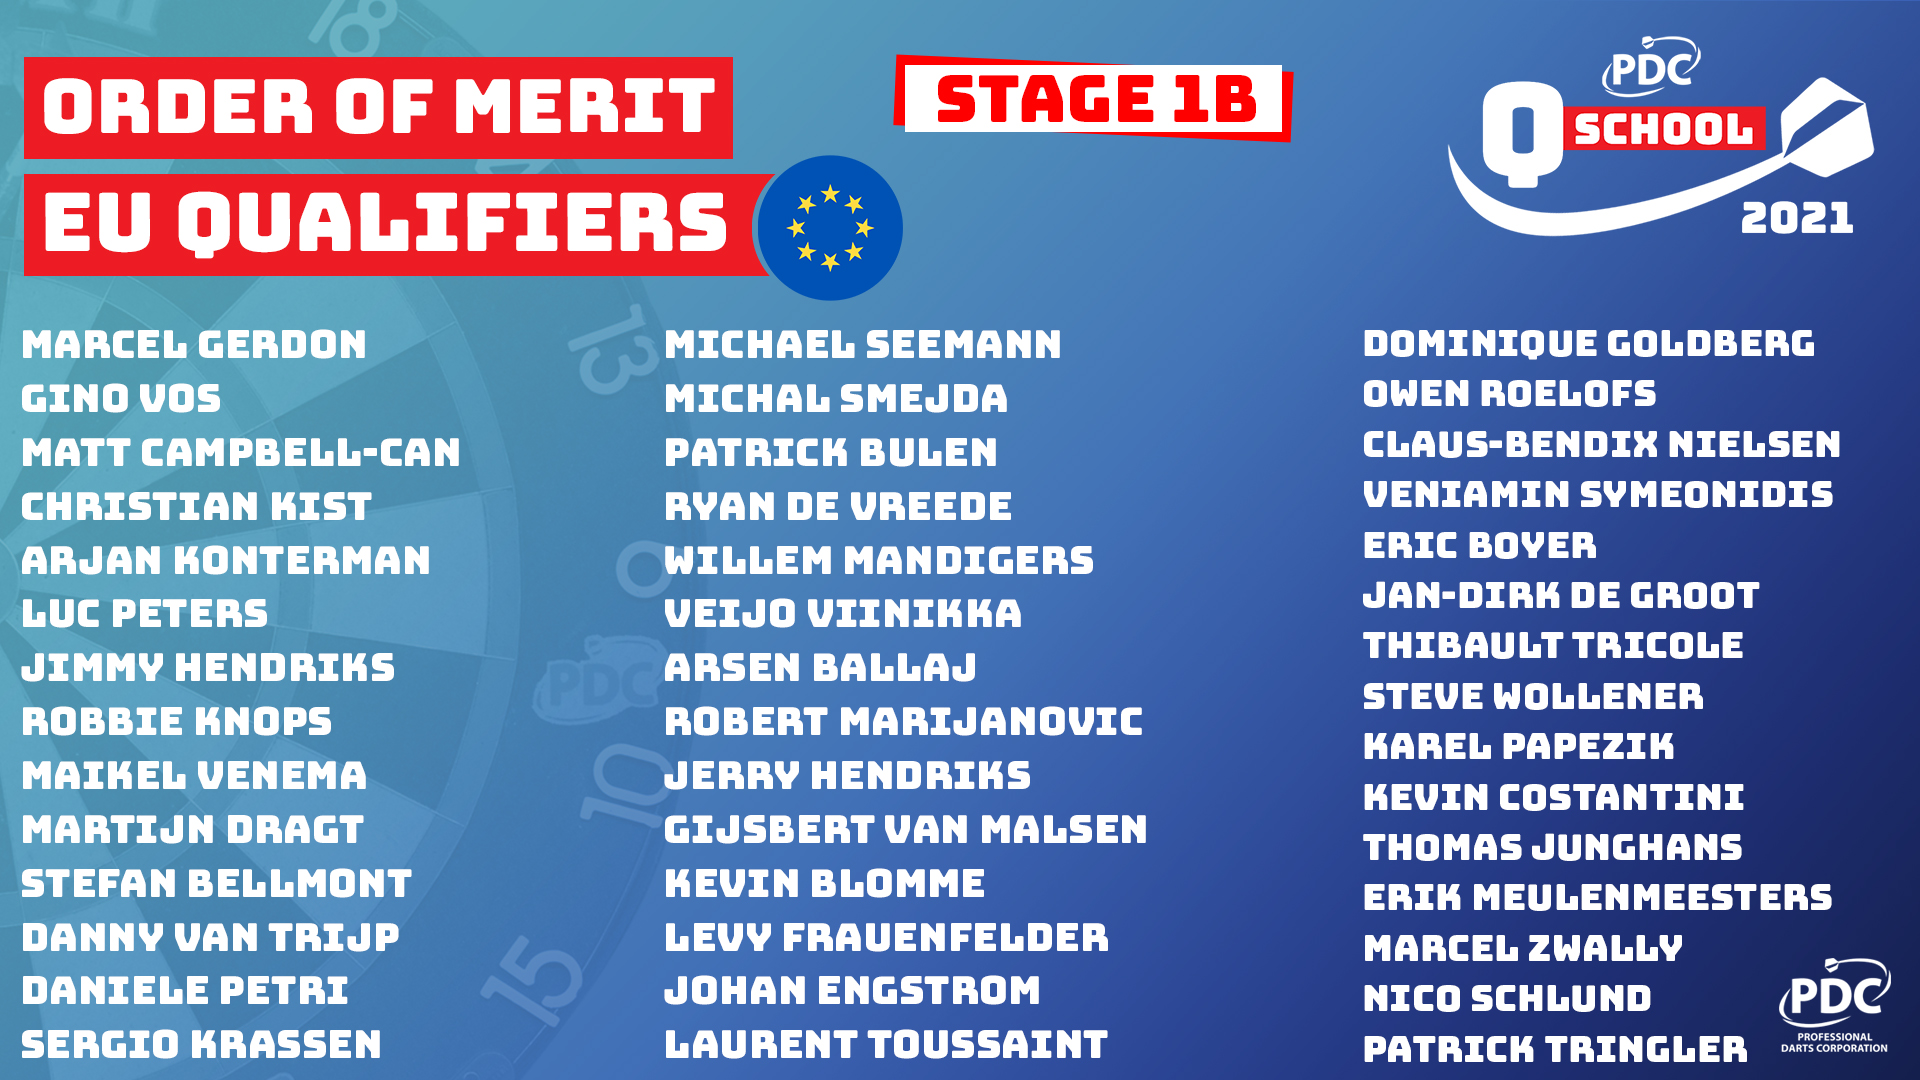 European Stage 1B Order of Merit Qualifiers